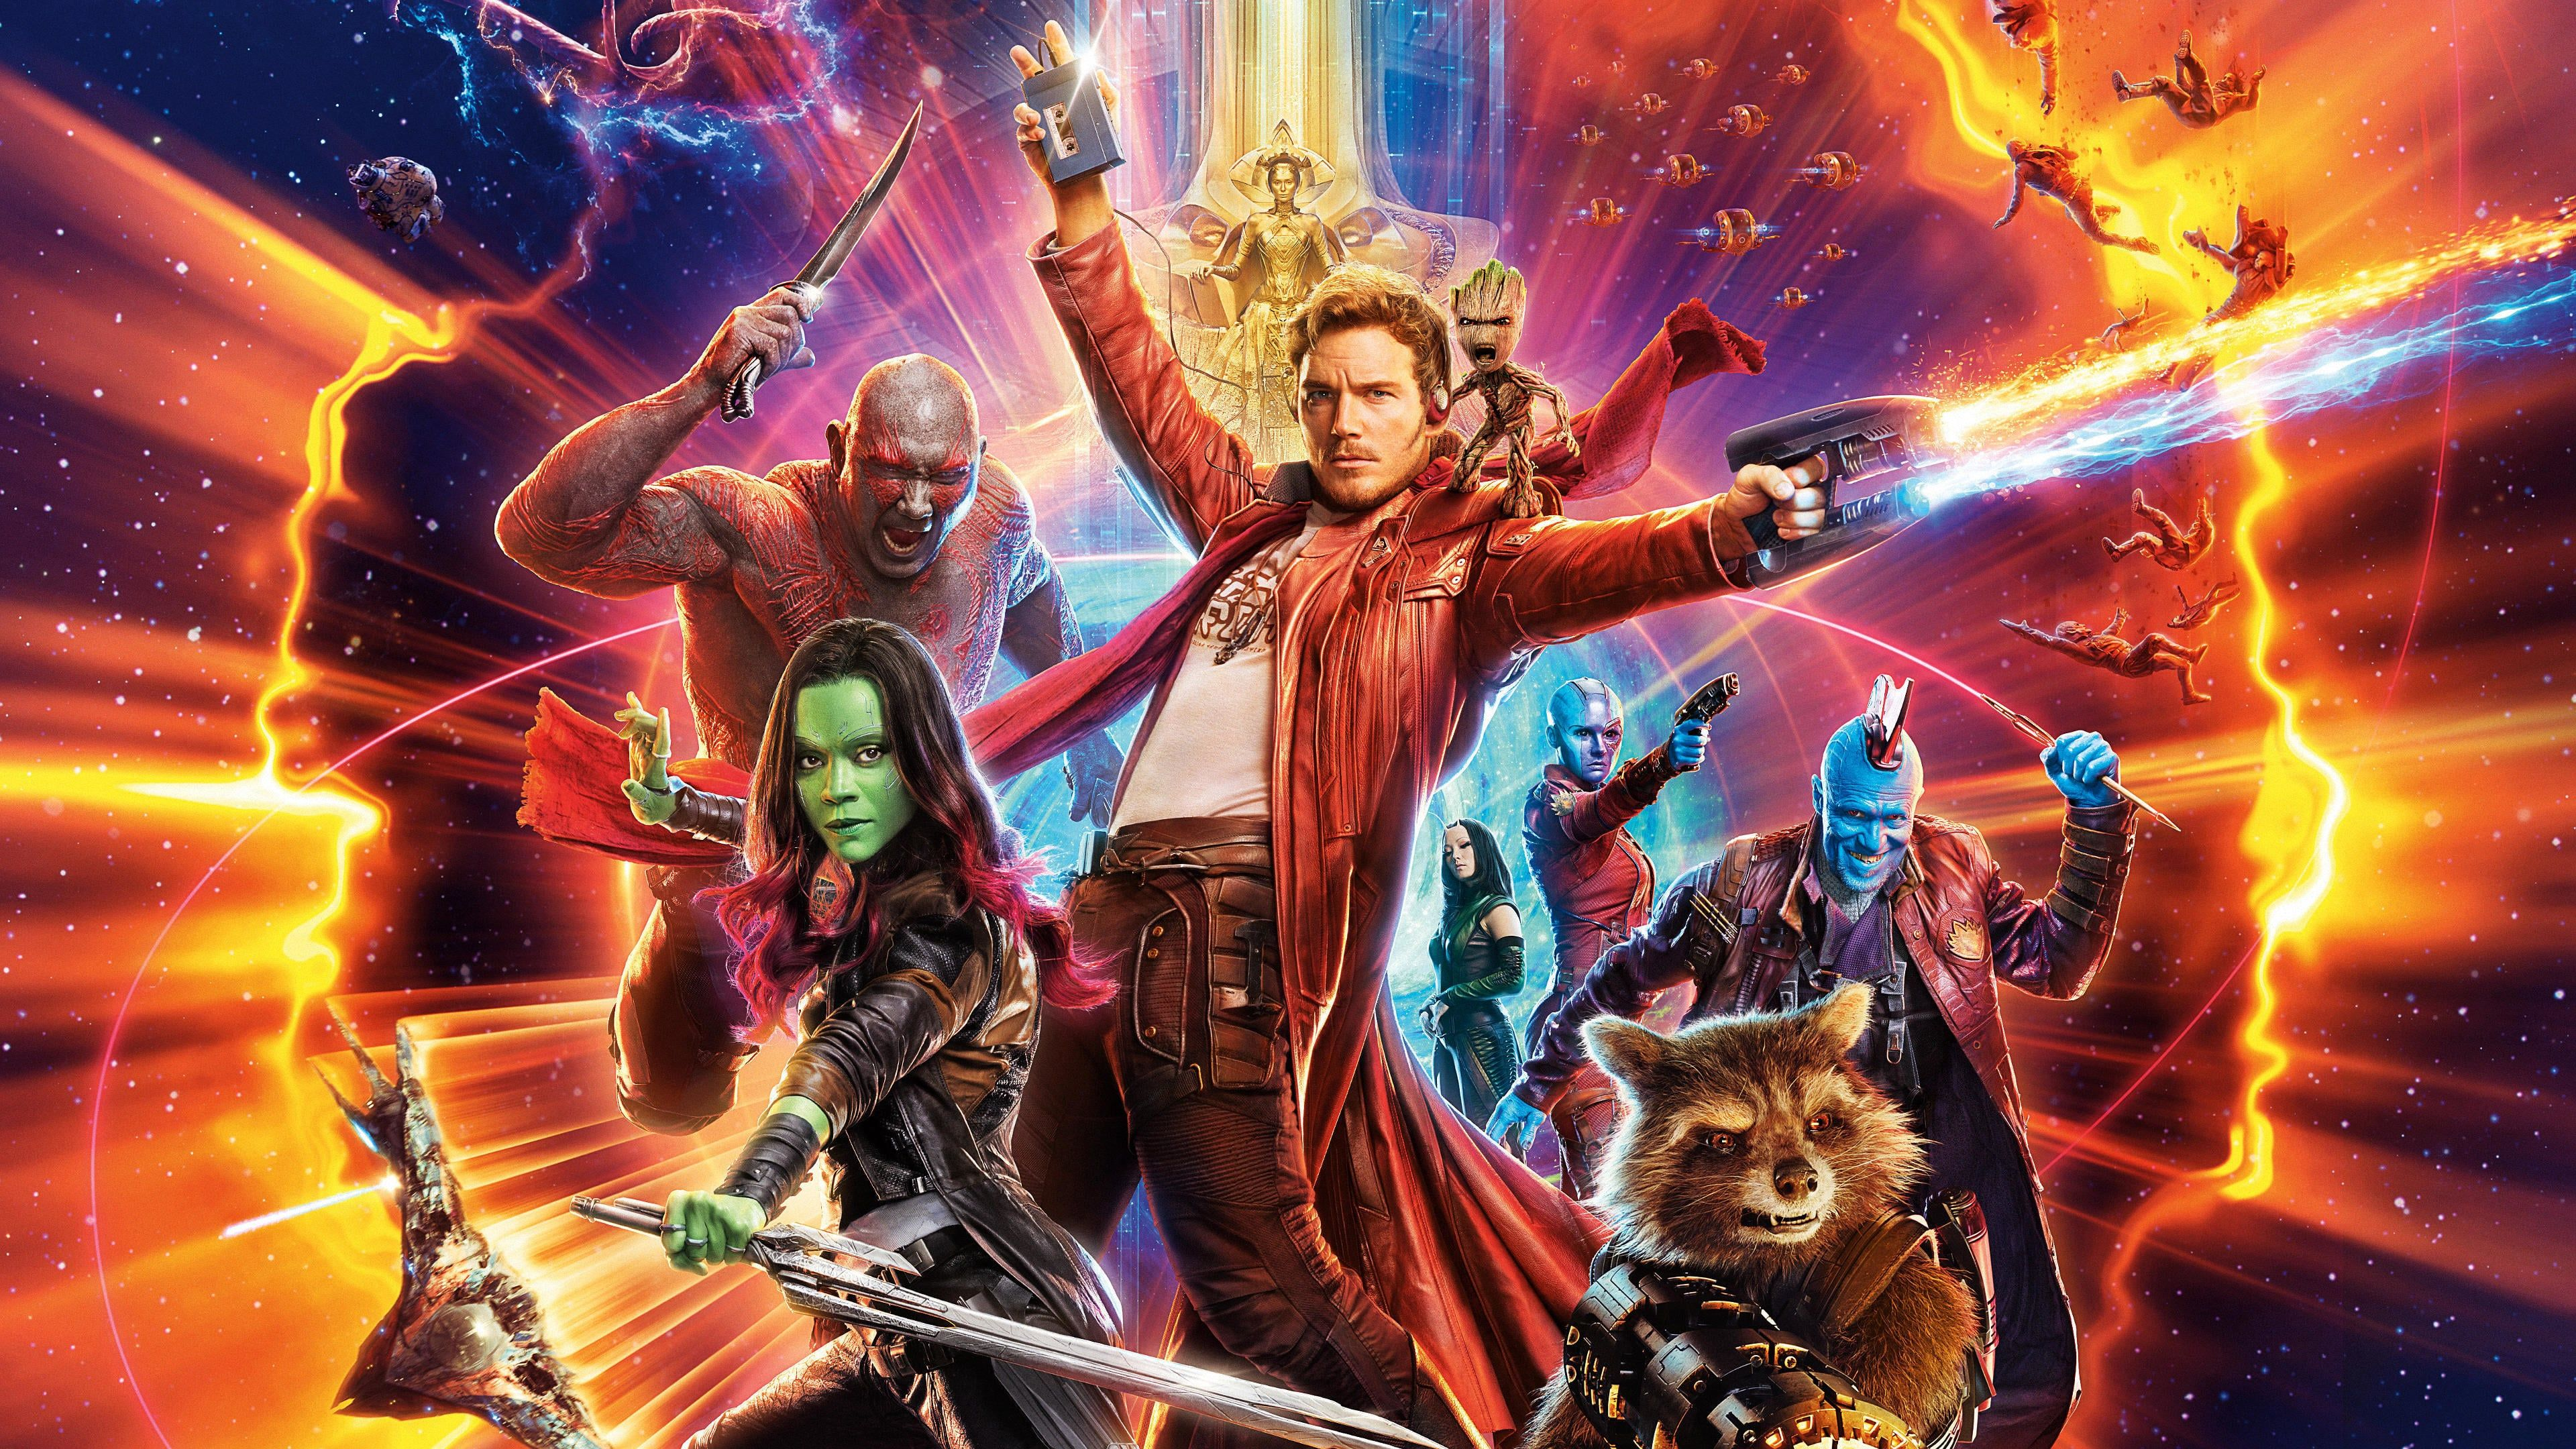 Guardians Of The Galaxy Vol 2 2017 Ganzer Film Deutsch Komplett Kino Guardians Of The Galaxy Vol 2 2017comple Guardians Of The Galaxy Marvel Cinematic Marvel